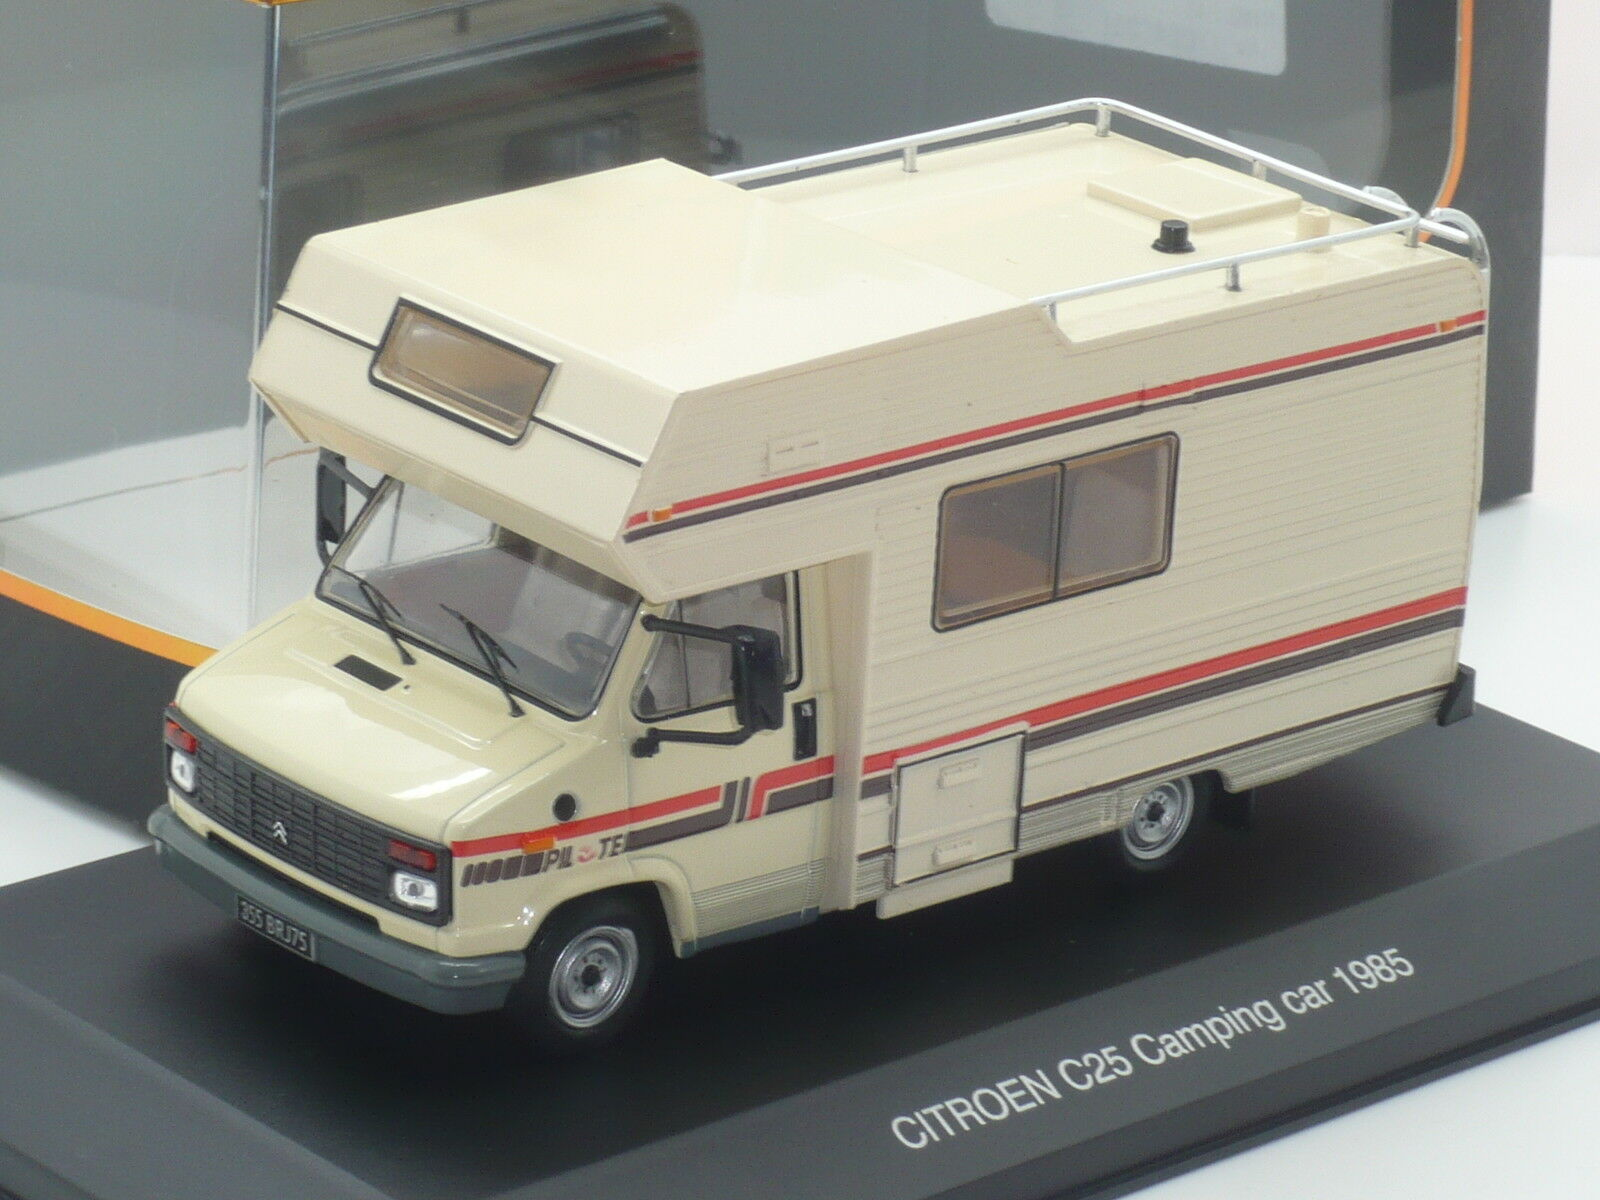 Nuevo 1 43 IXO Citroen C25 Camper Van N Talbot Express Diesel AutoCocheavana Camión 1986